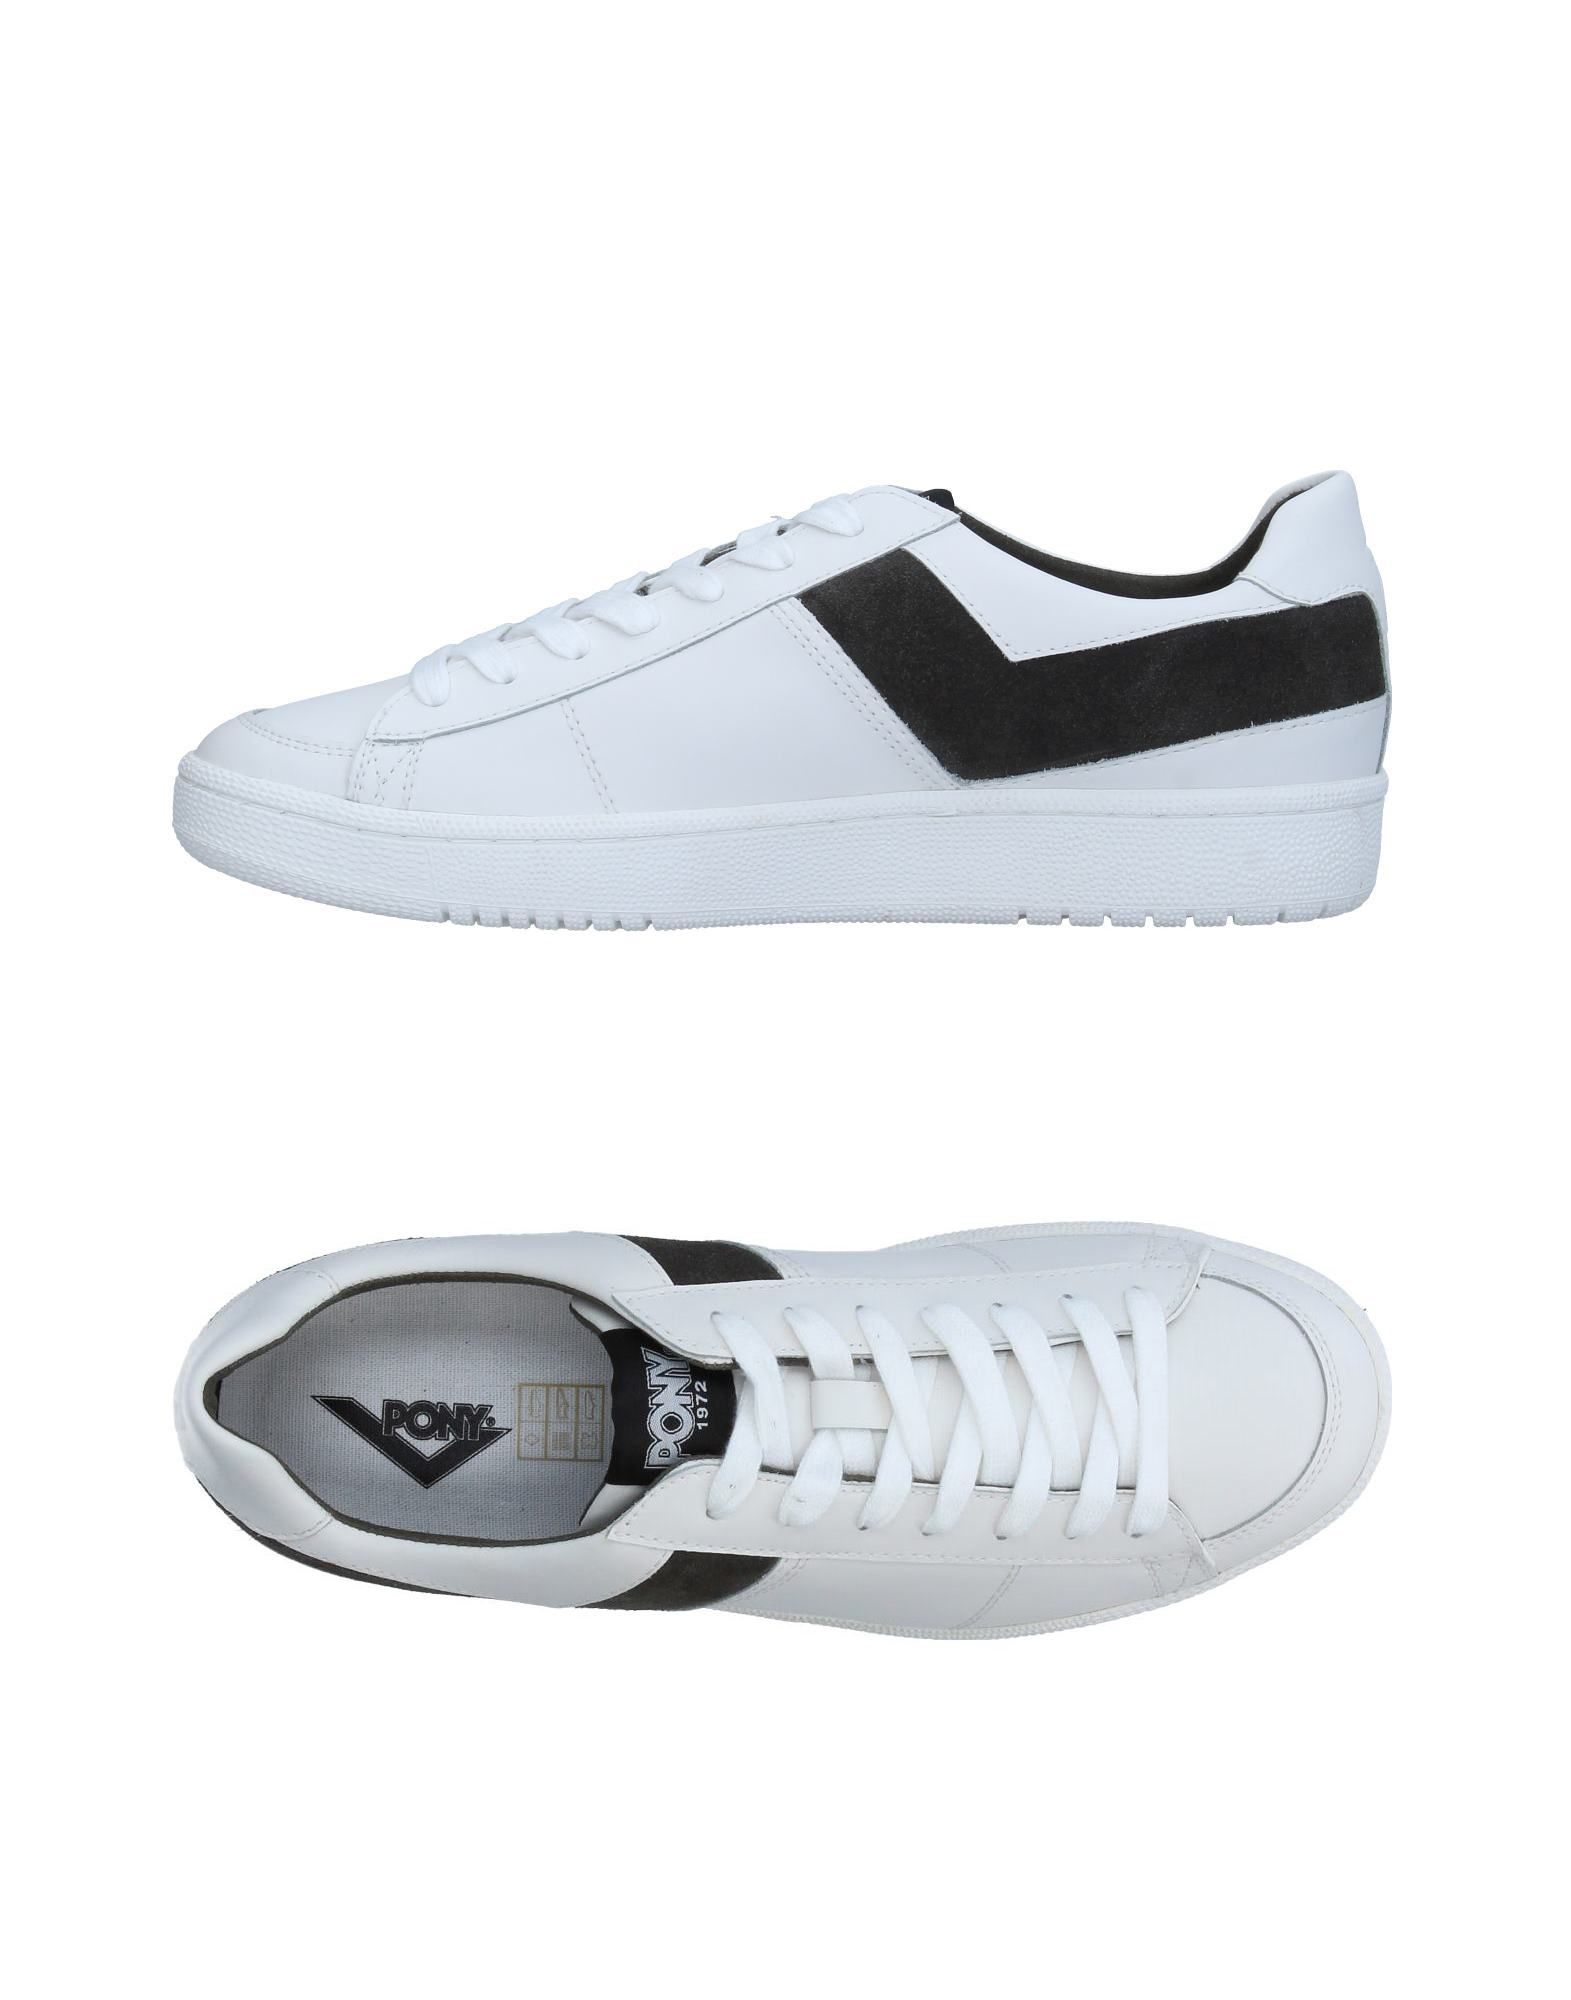 Moda 11340431VL Sneakers Pony Uomo - 11340431VL Moda e0d1ac